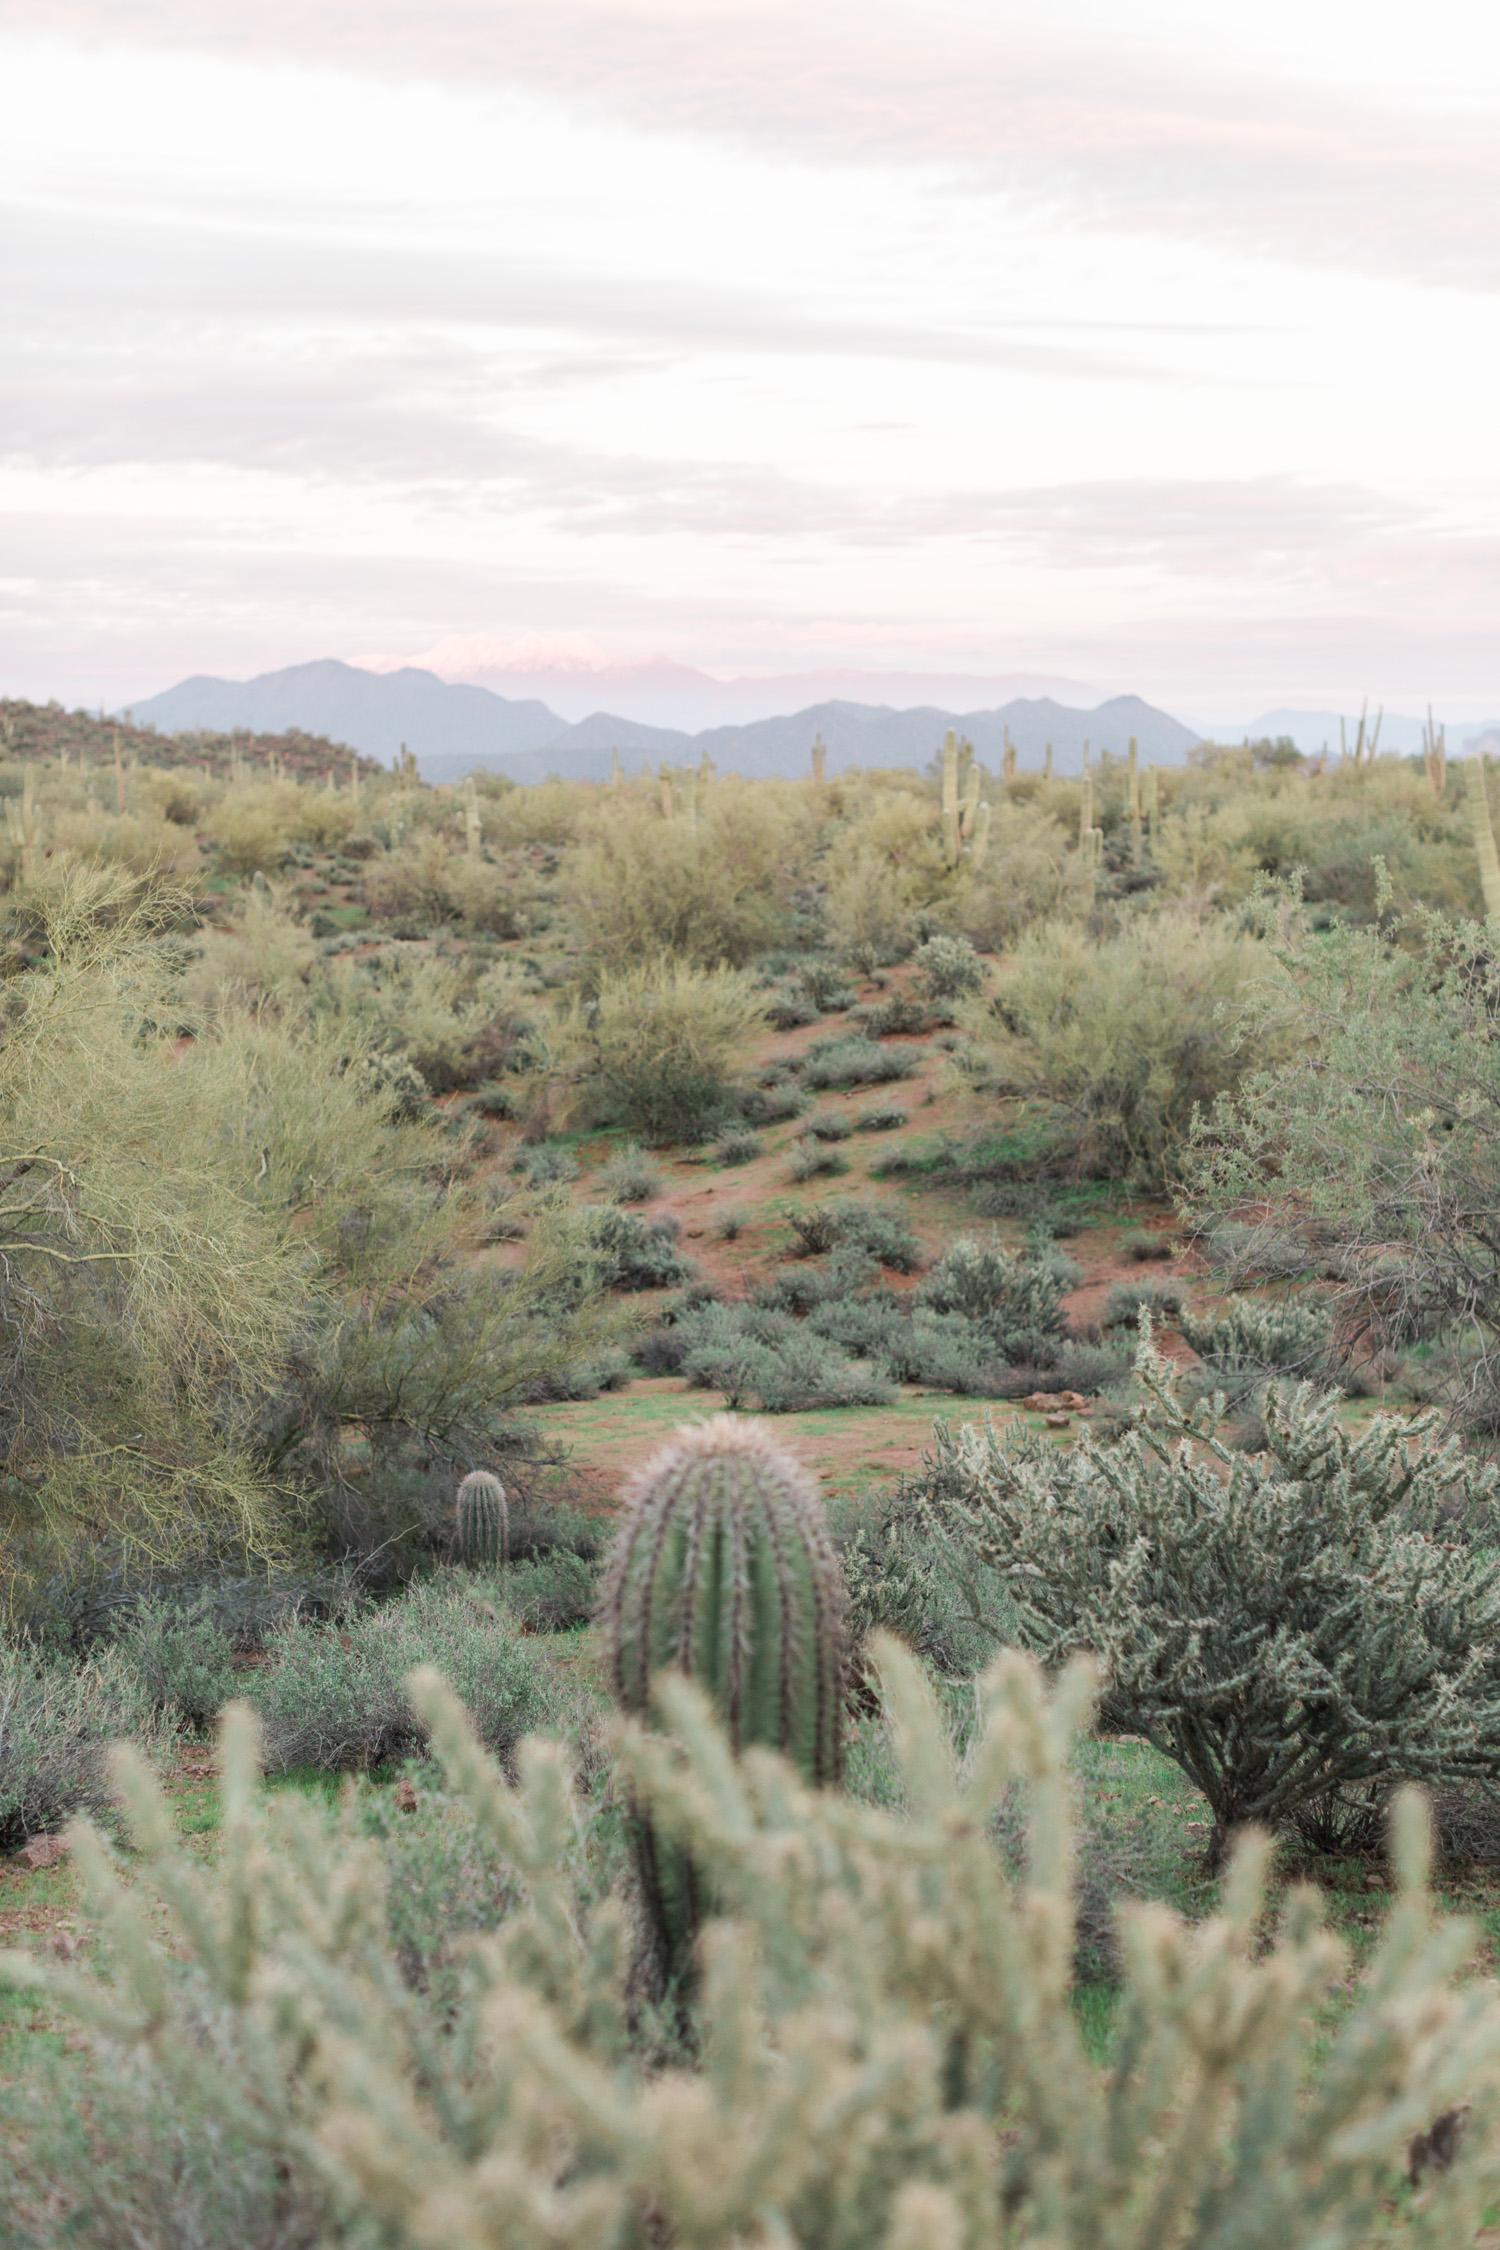 Phoenix, Arizona desert at sunset. Love the cactus in the foreground.